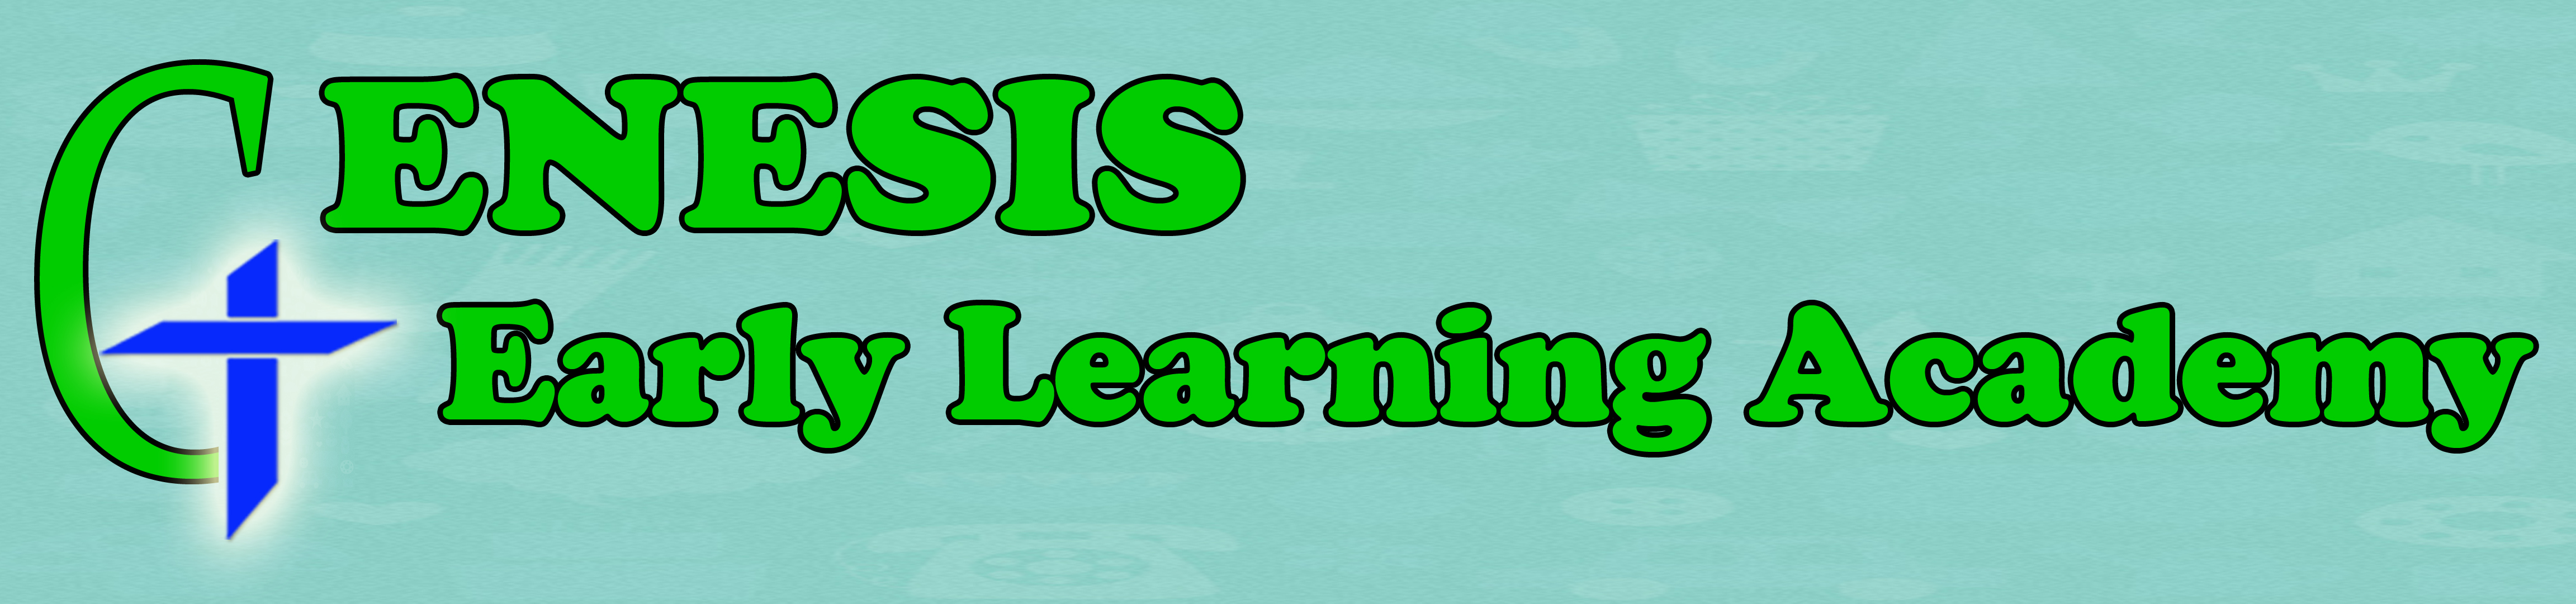 Genesis Early Learning Academy